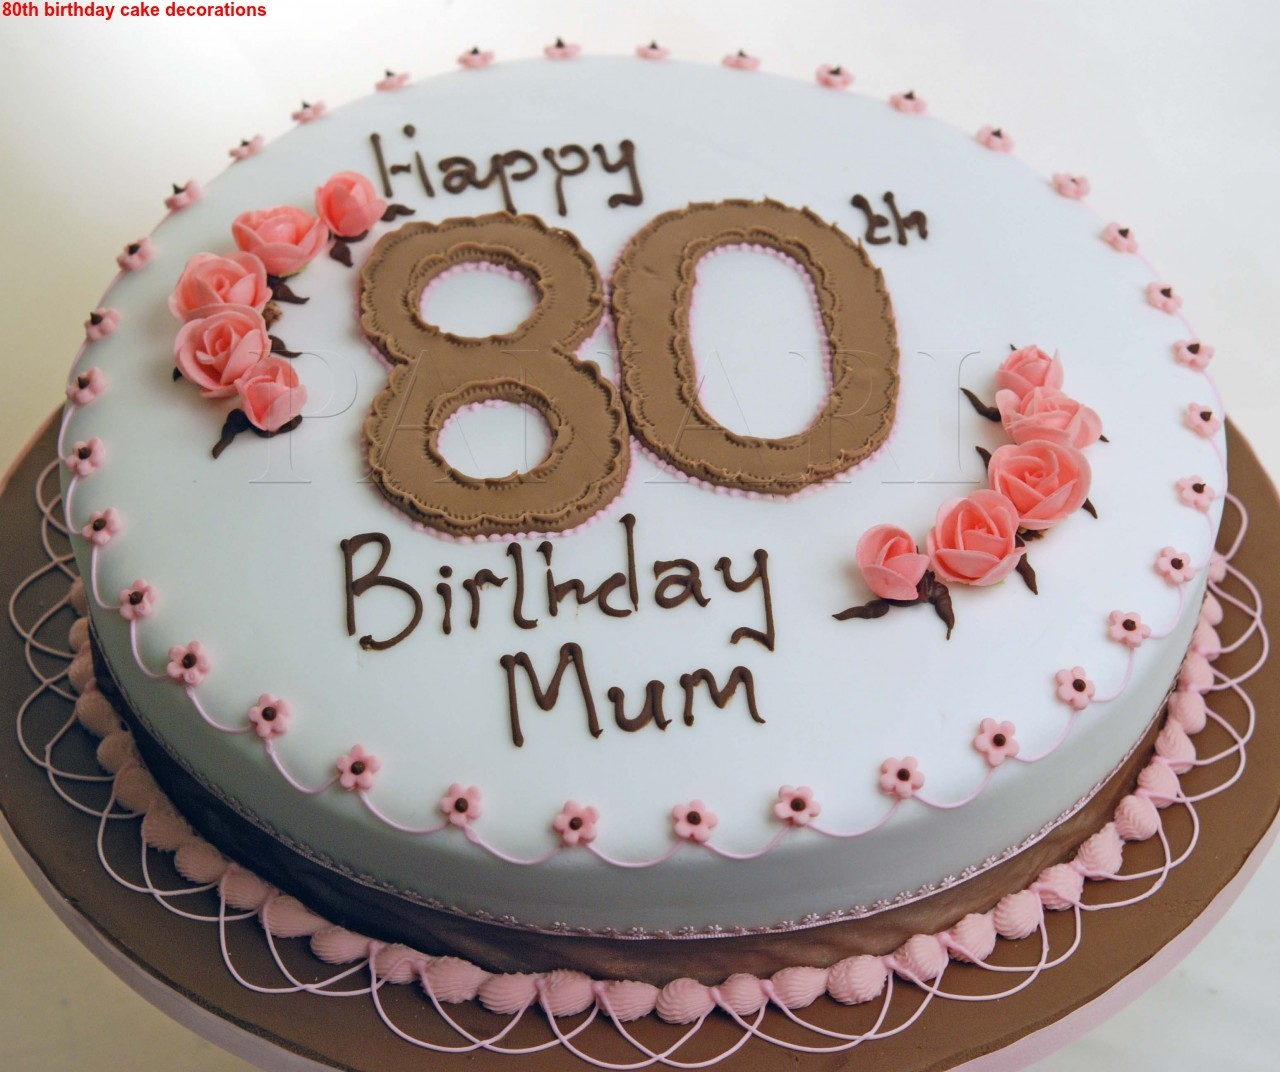 80th birthday cake decorations decorating pinterest 736x529 best - Birthday Cake Decorations